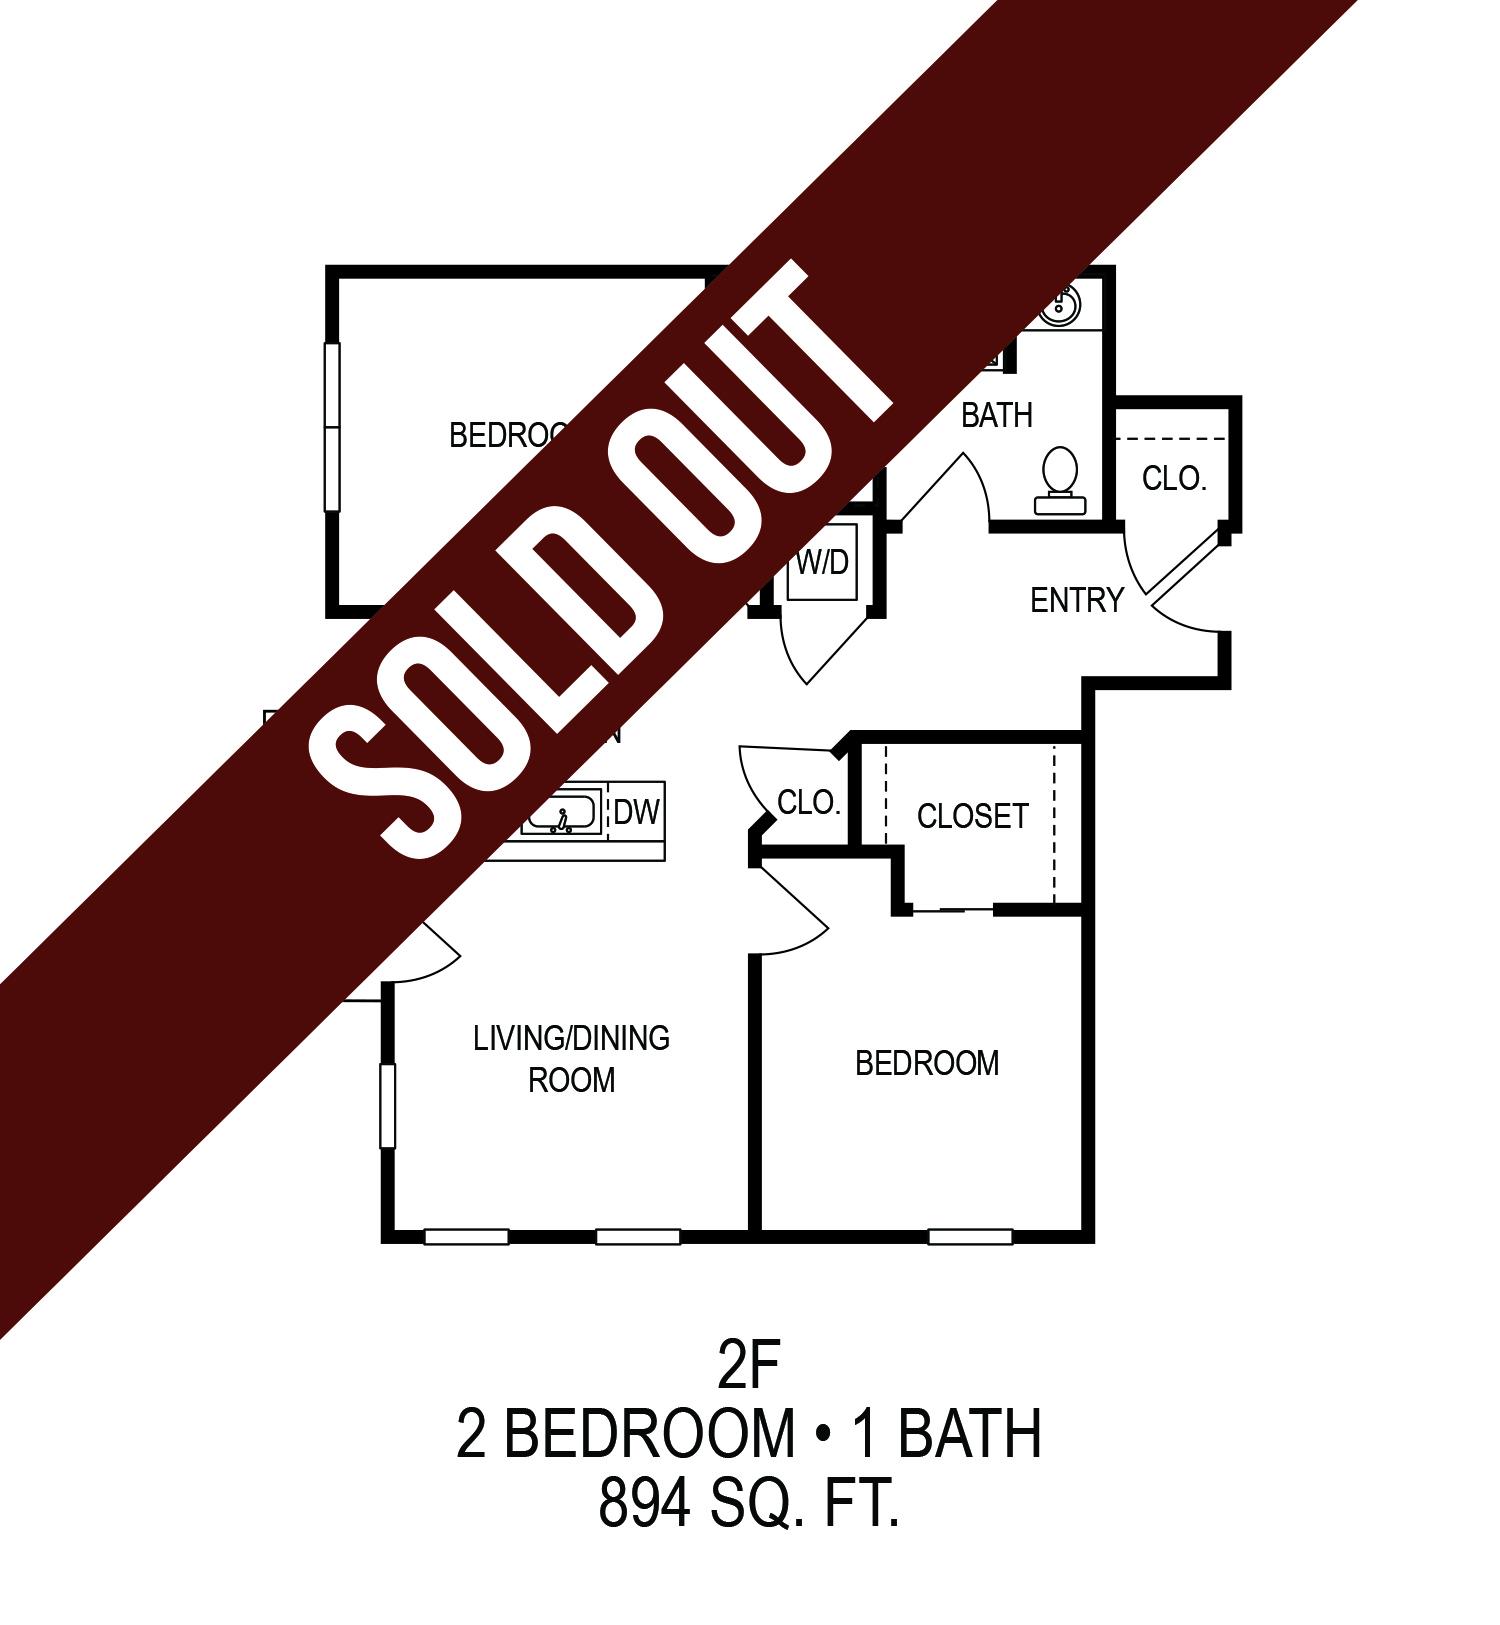 625 S. Goodman Apartments - Floorplan - Two Bedroom (F)